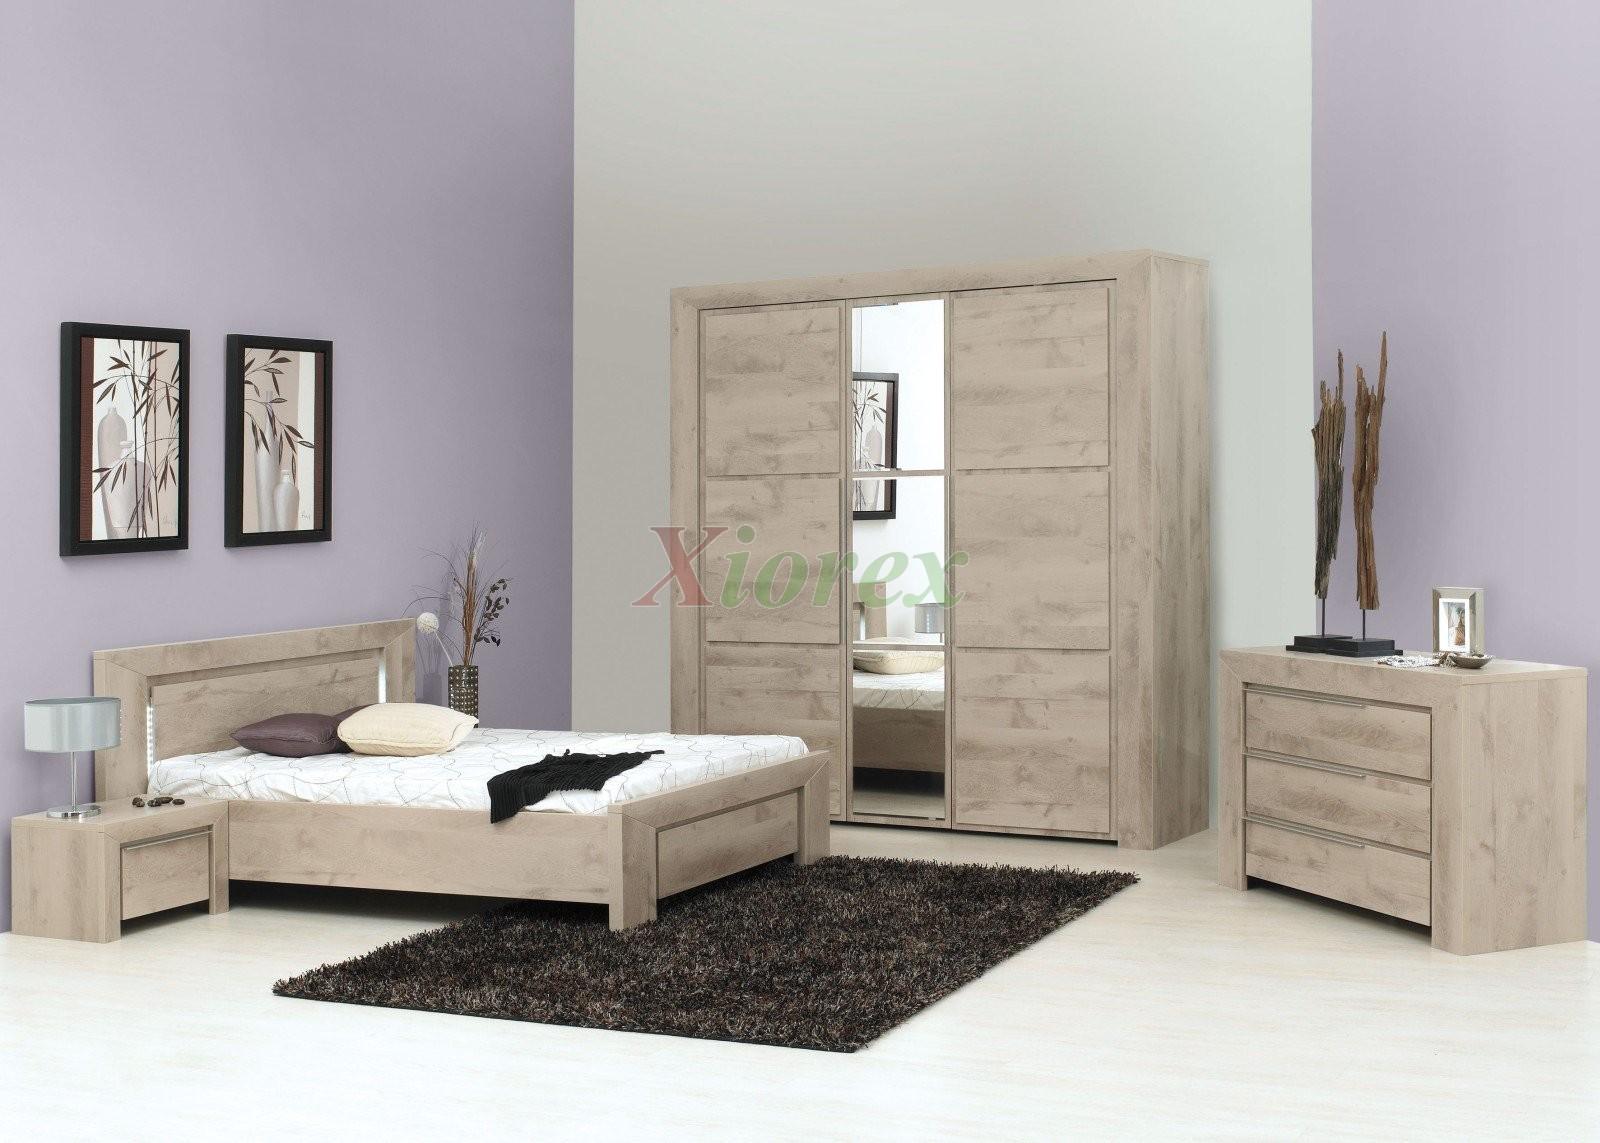 Gami Bed Set Gami Sarlat Bed Sarlat Gami Bed Set By